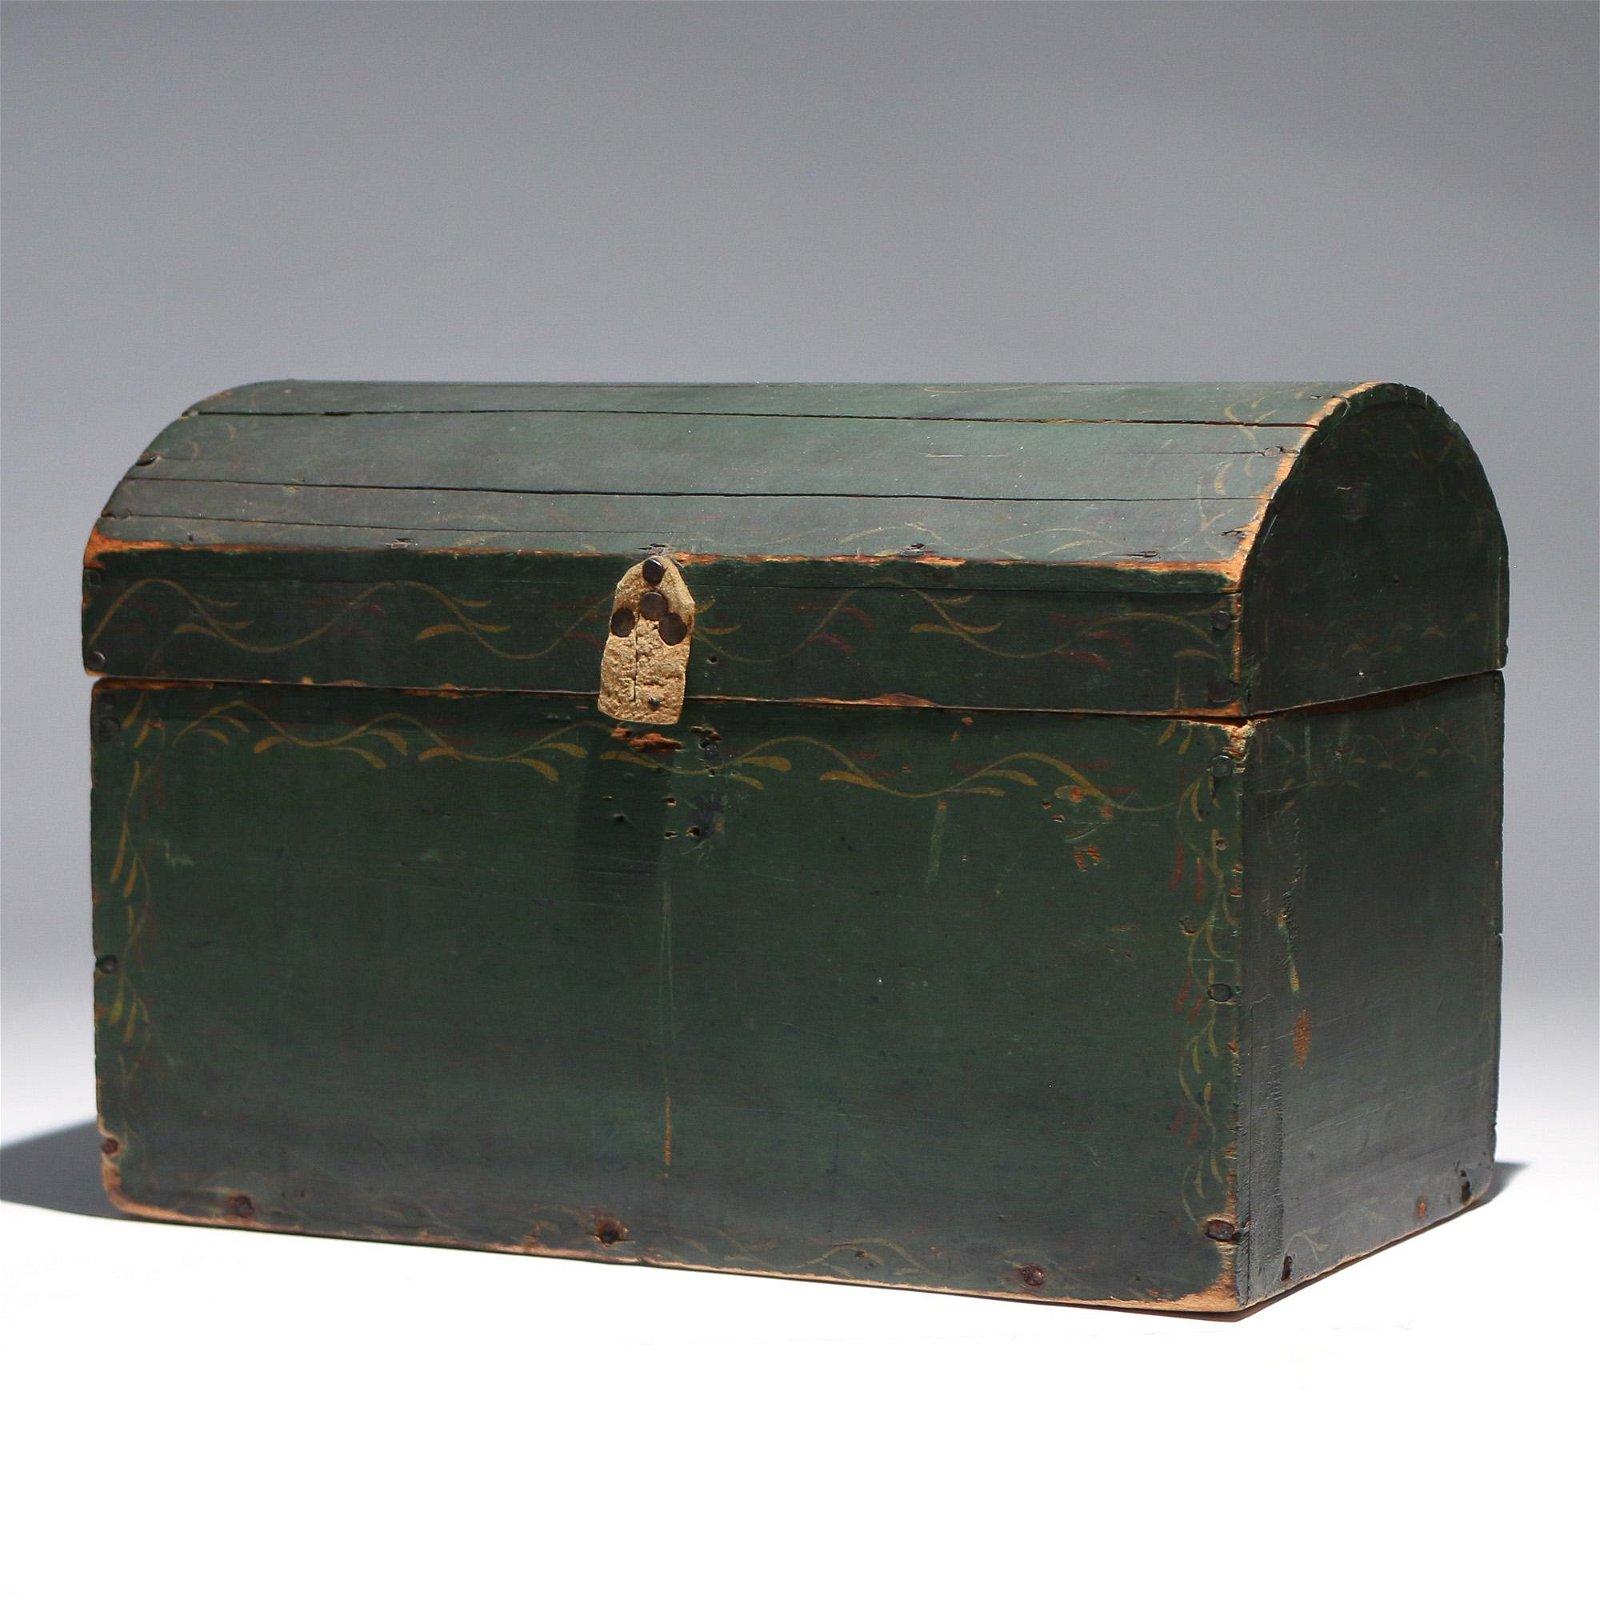 AMERICAN PRIMITIVE PAINTED PINE BOX